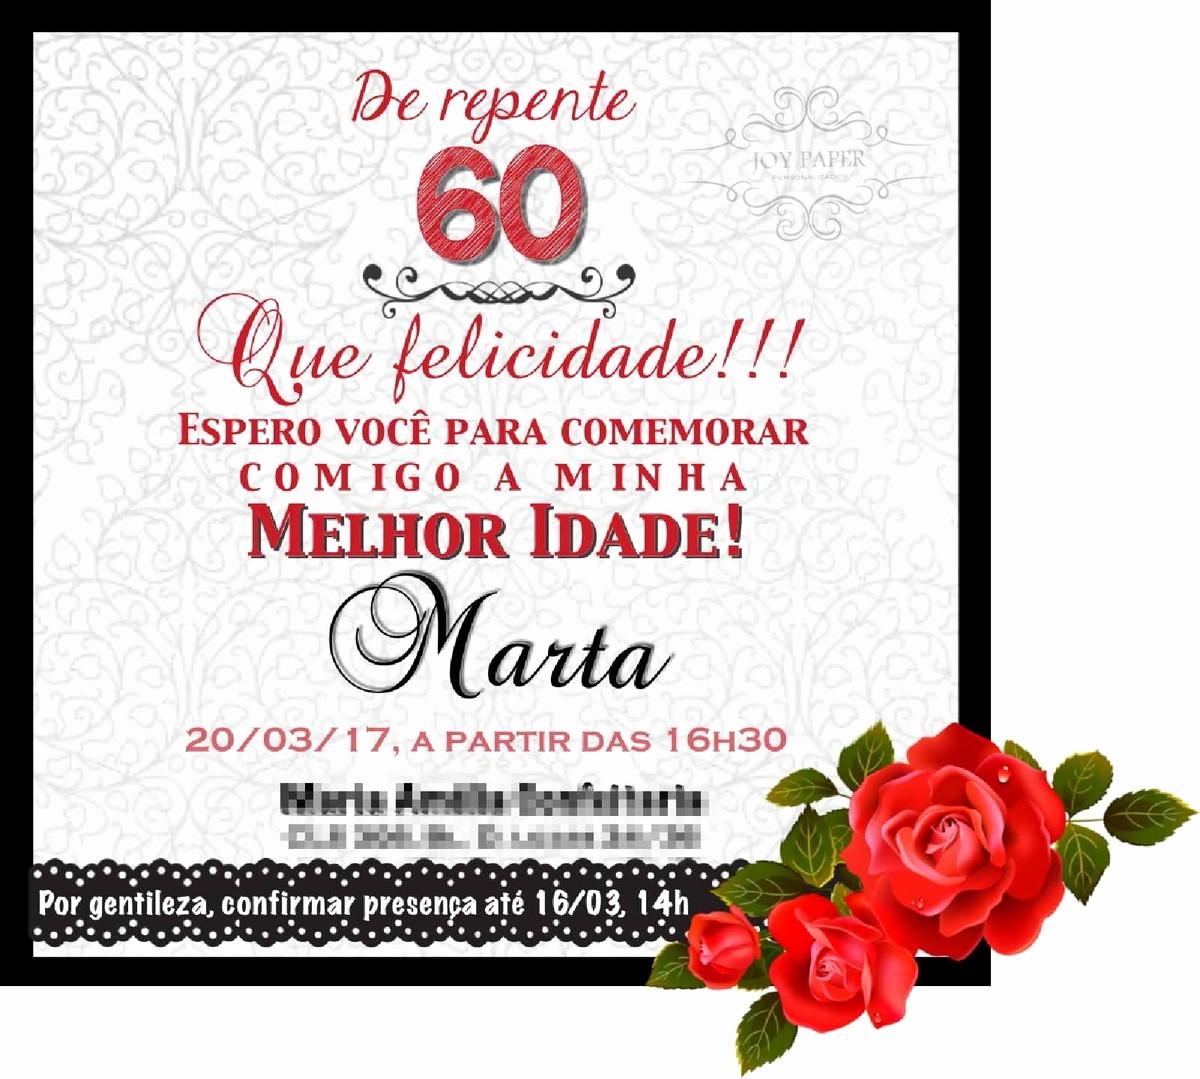 Moldes Para Convites De Aniversario Elegant Convite Digital Festa 60 Anos No Elo7